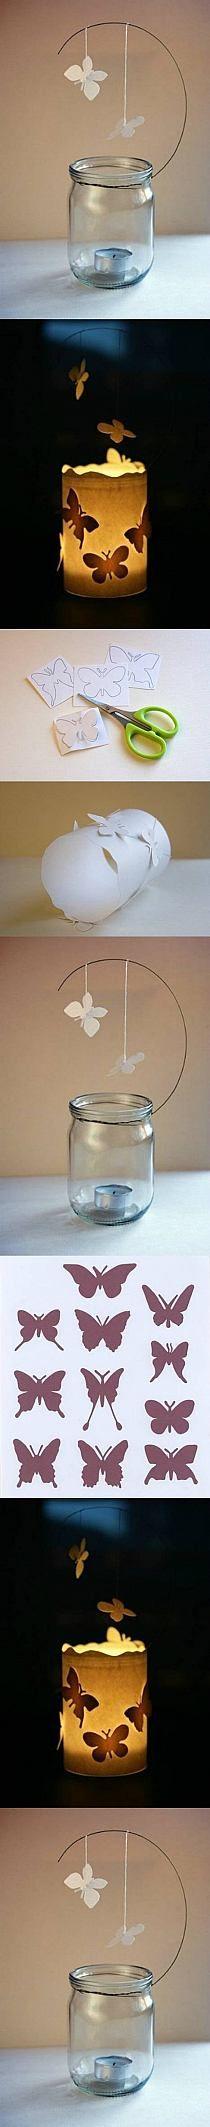 DIY Paper Butterfly Mobile DIY Projects   UsefulDIY.com